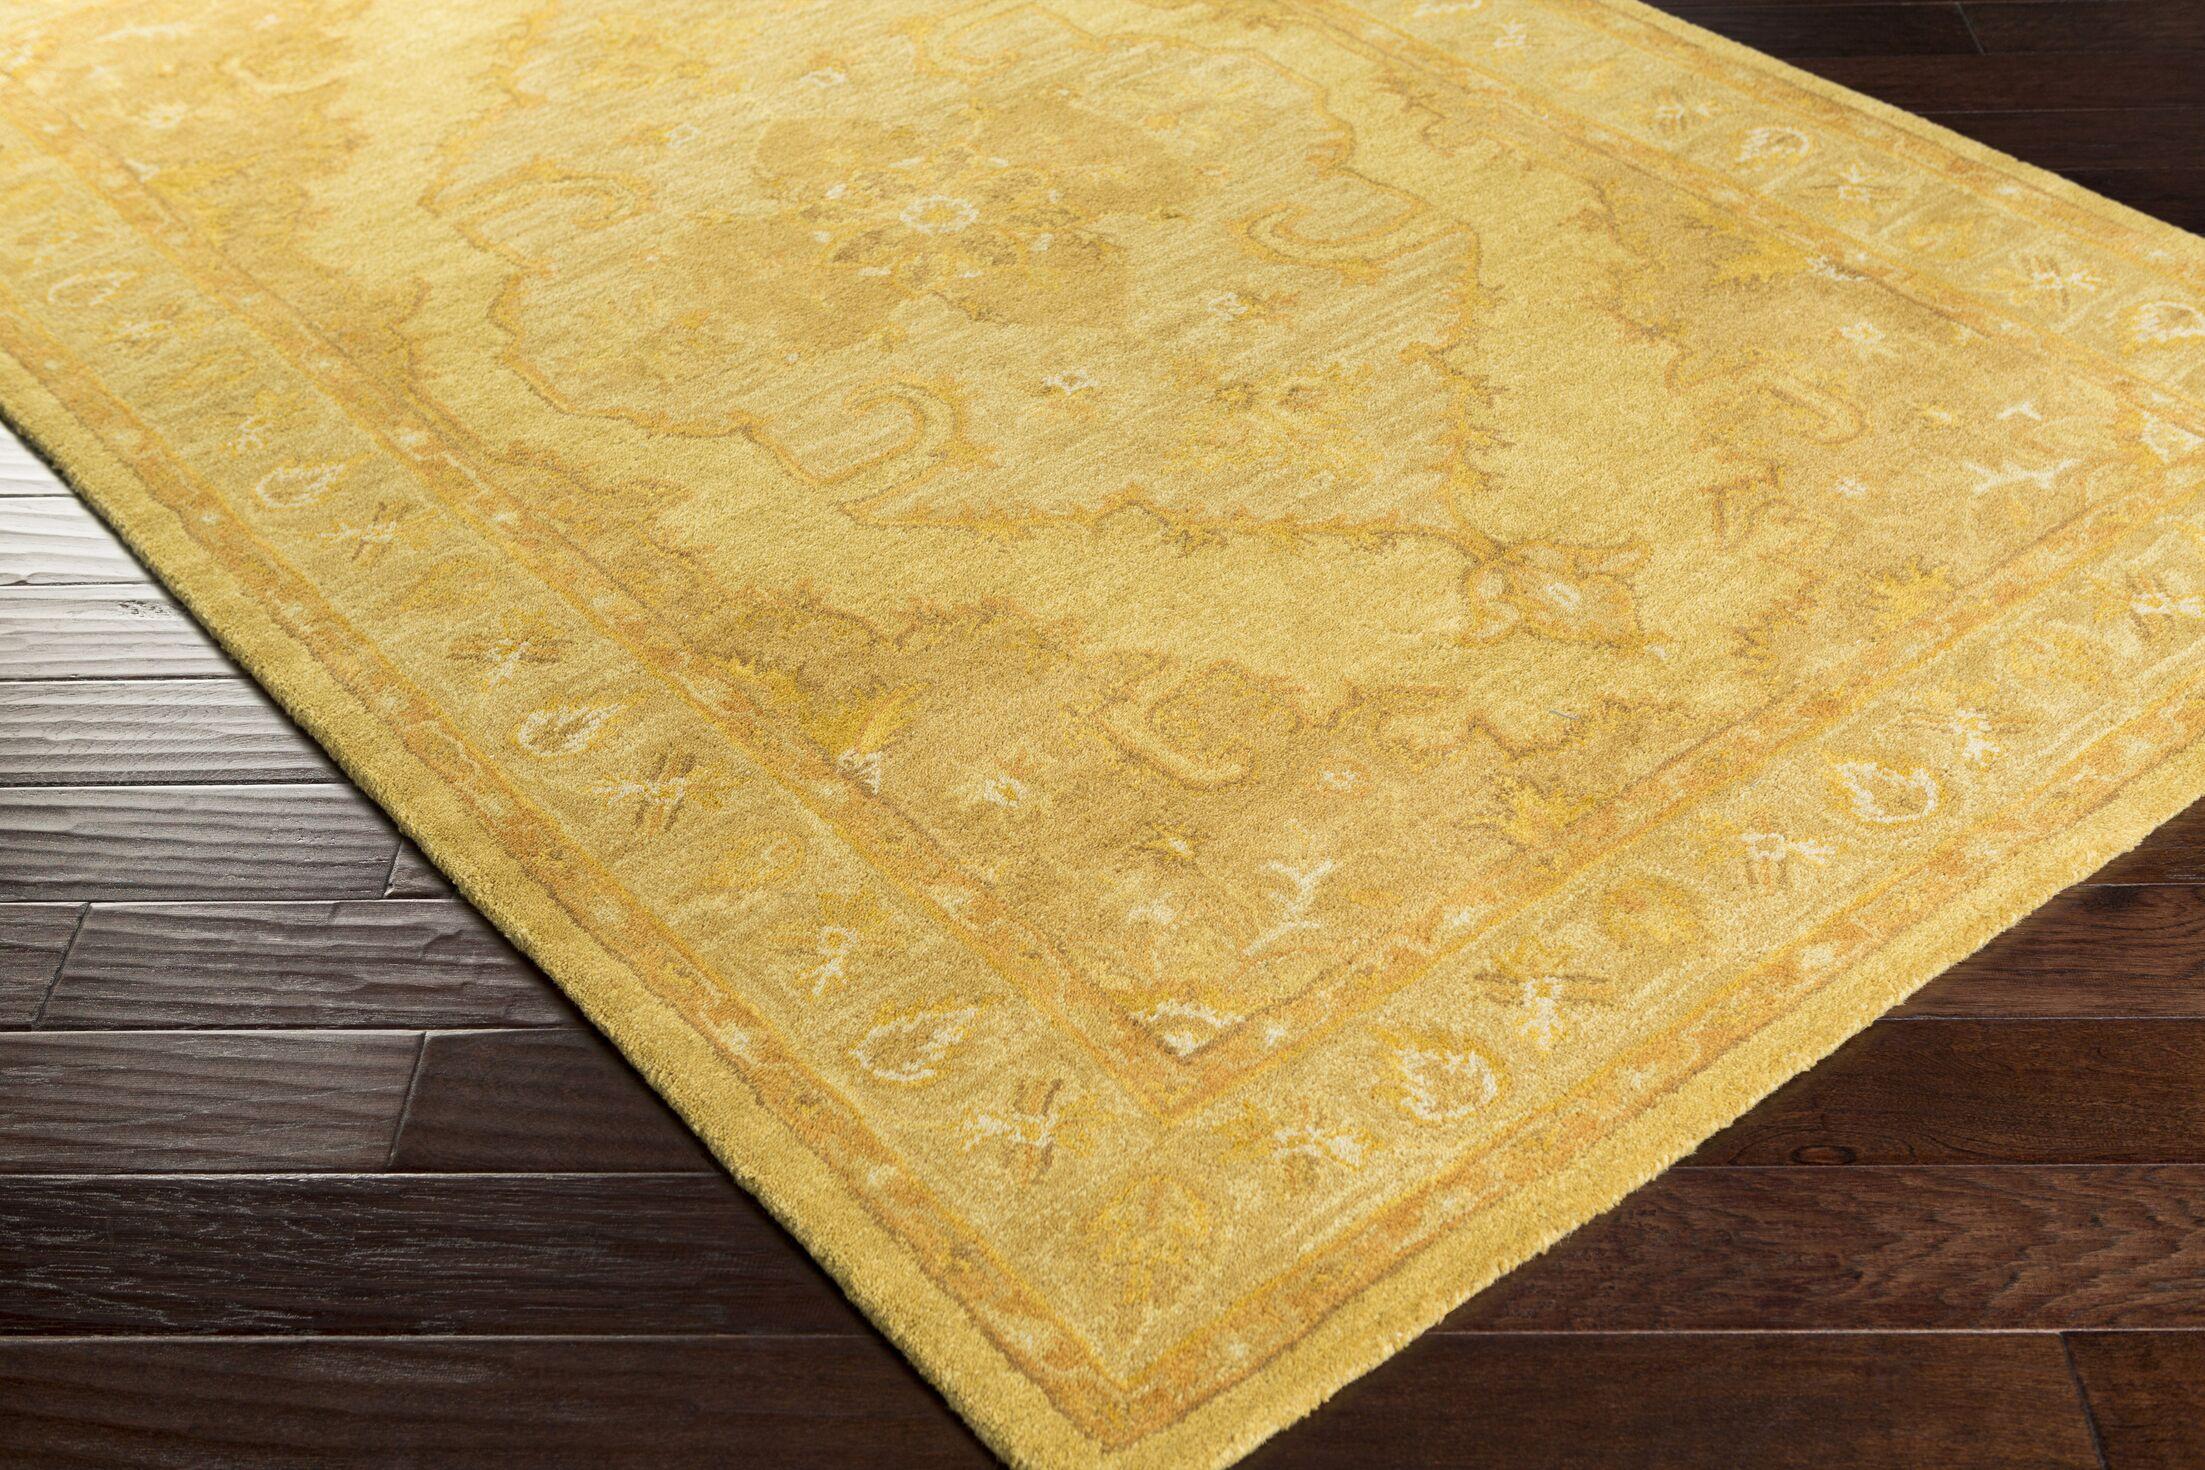 Eaddy Hand-Tufted Sunflower/Gold Area Rug Rug Size: Rectangle 6' x 9'